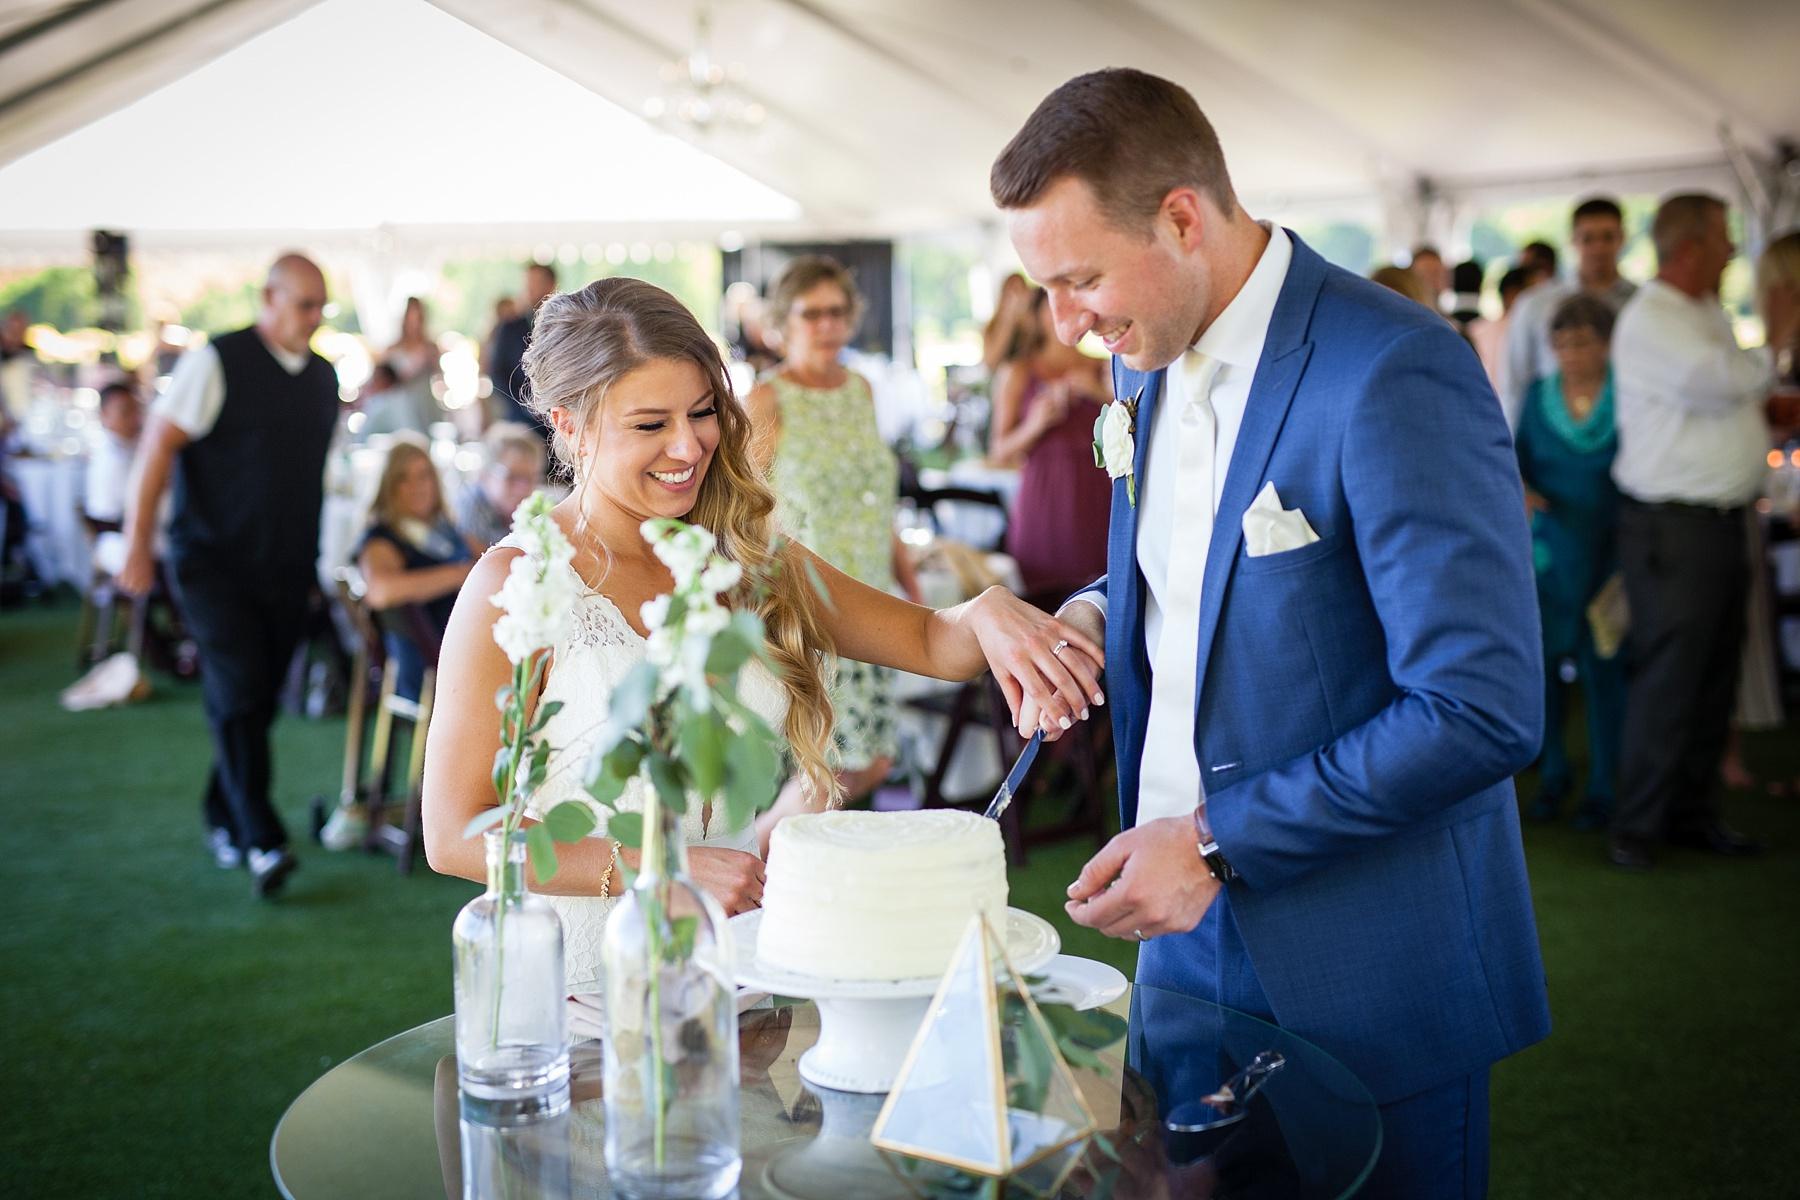 Brandon_Shafer_Photography_Kara_Doug_12_corners_Wedding_Benton_Harbor_0063.jpg